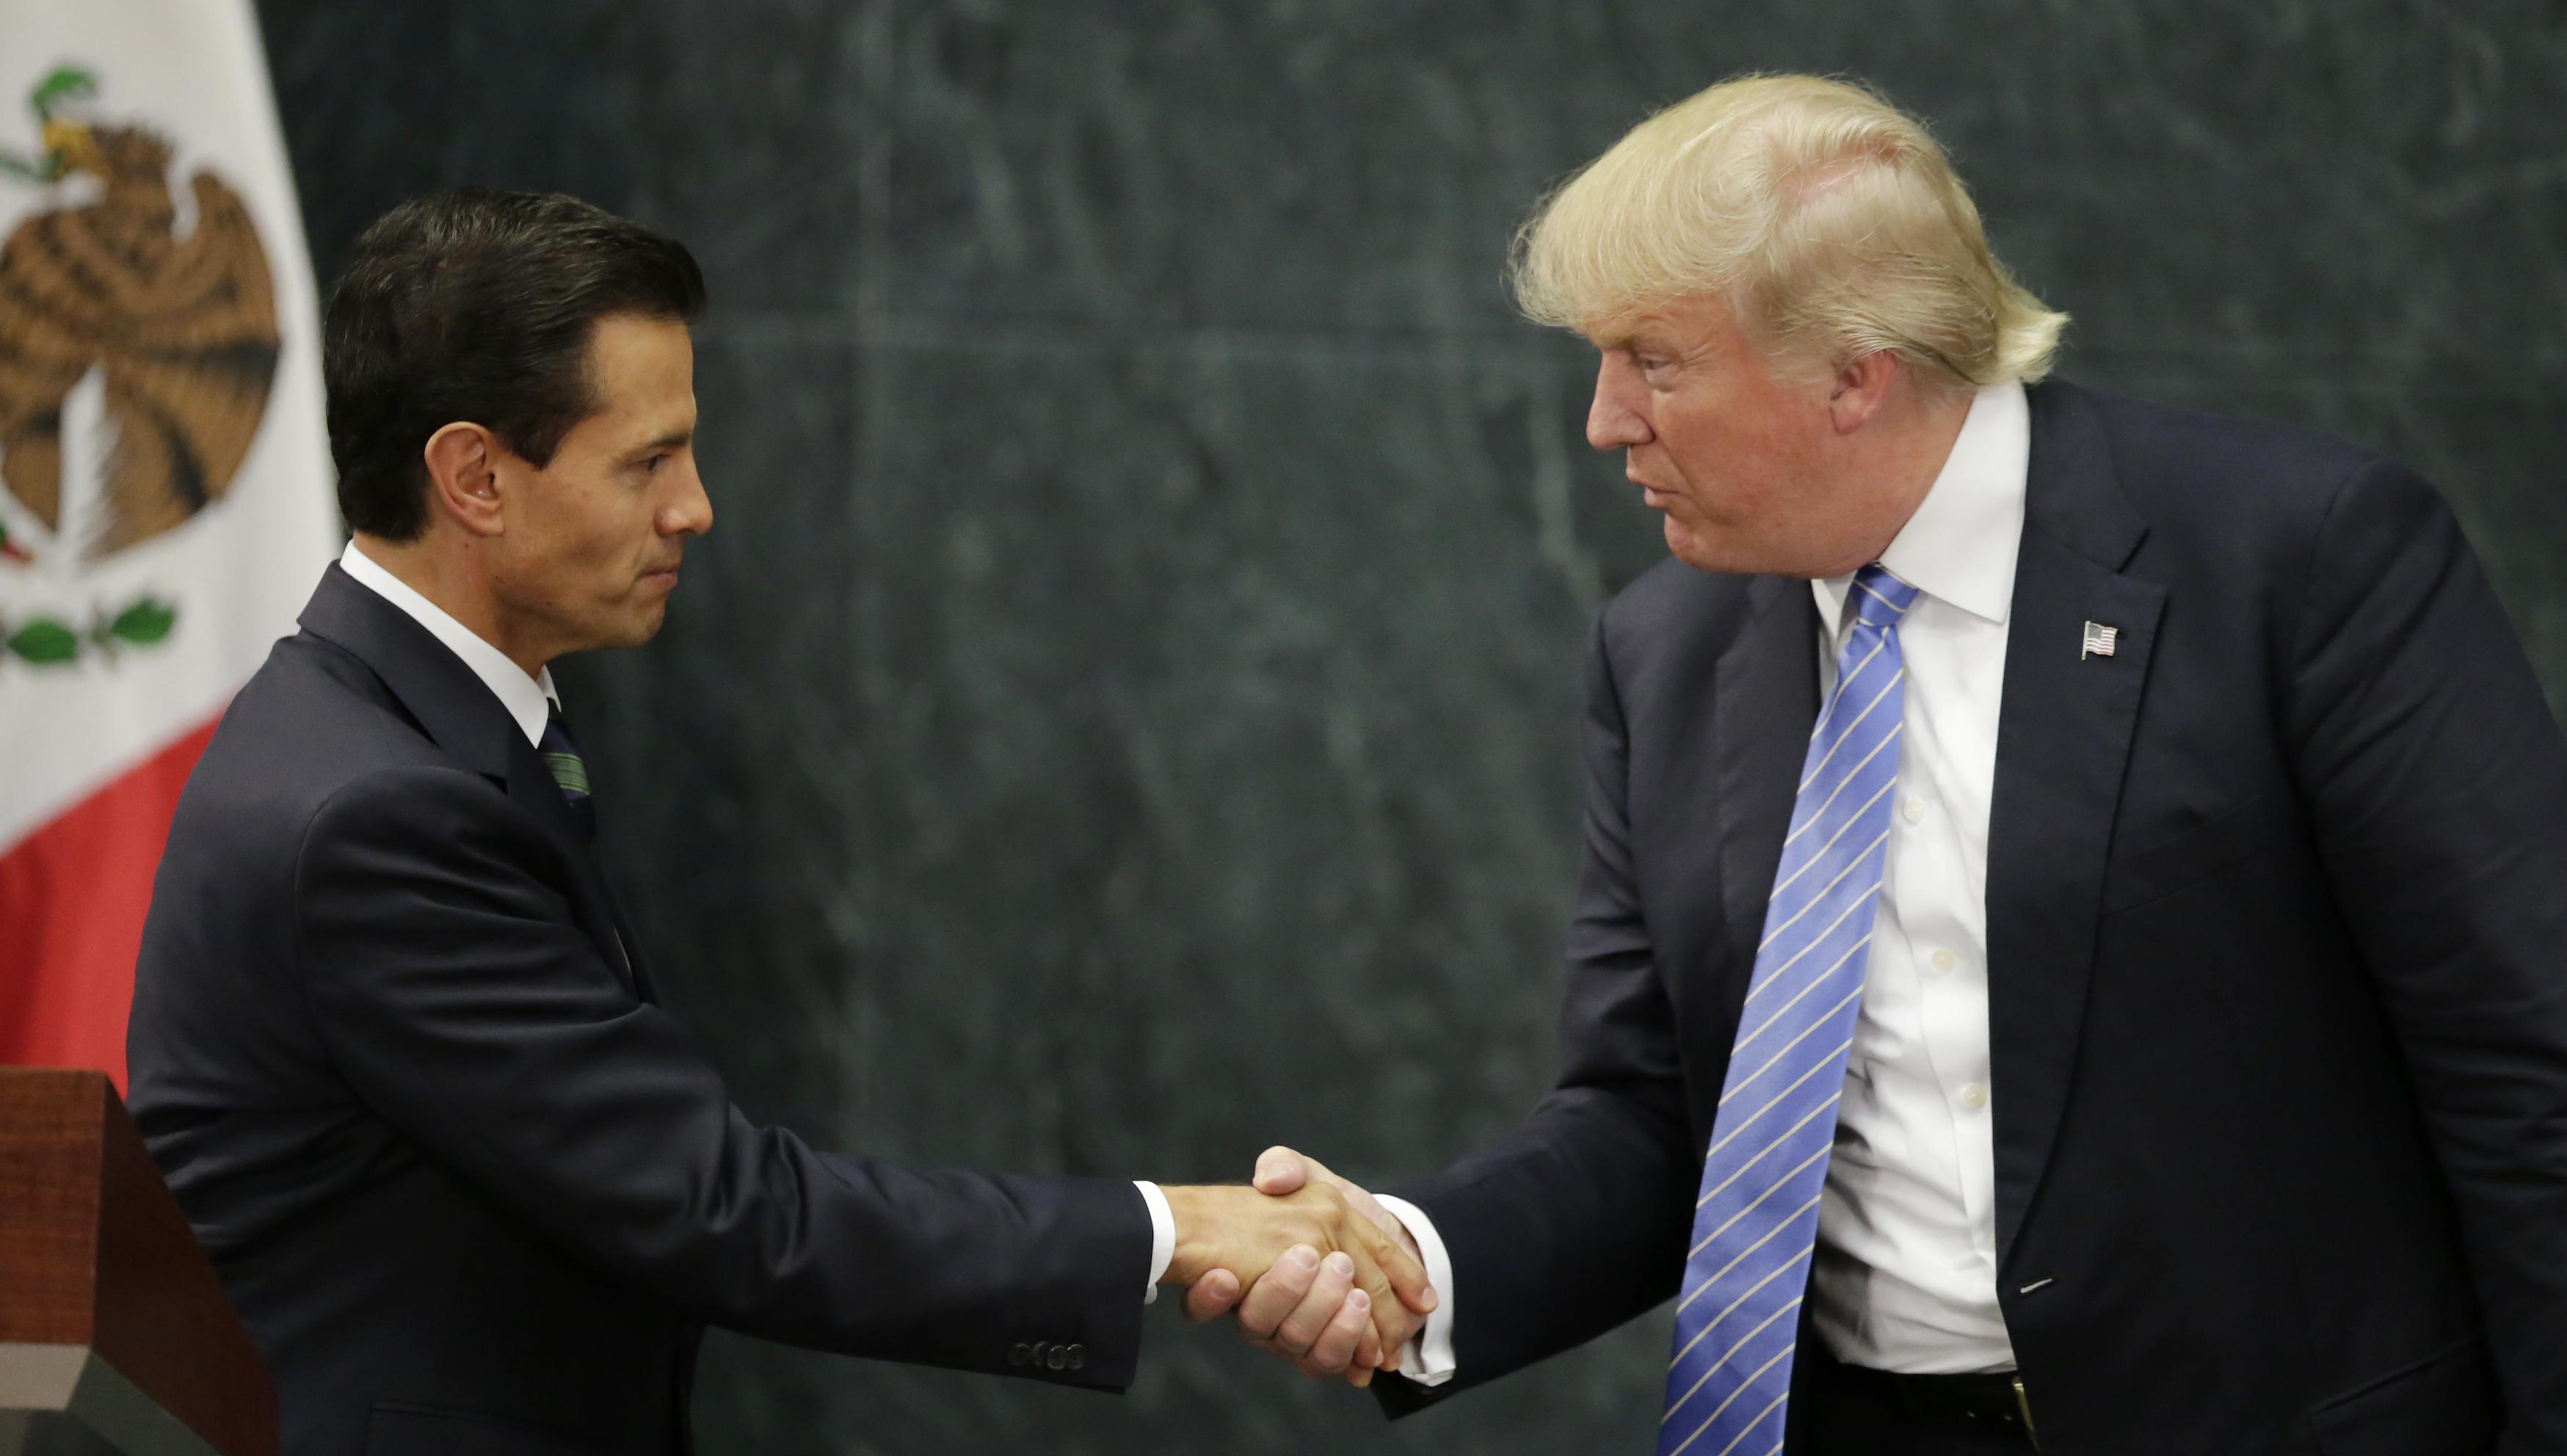 Donald Trump and Mexico's President Enrique Pena Nieto shake hands at a press conference